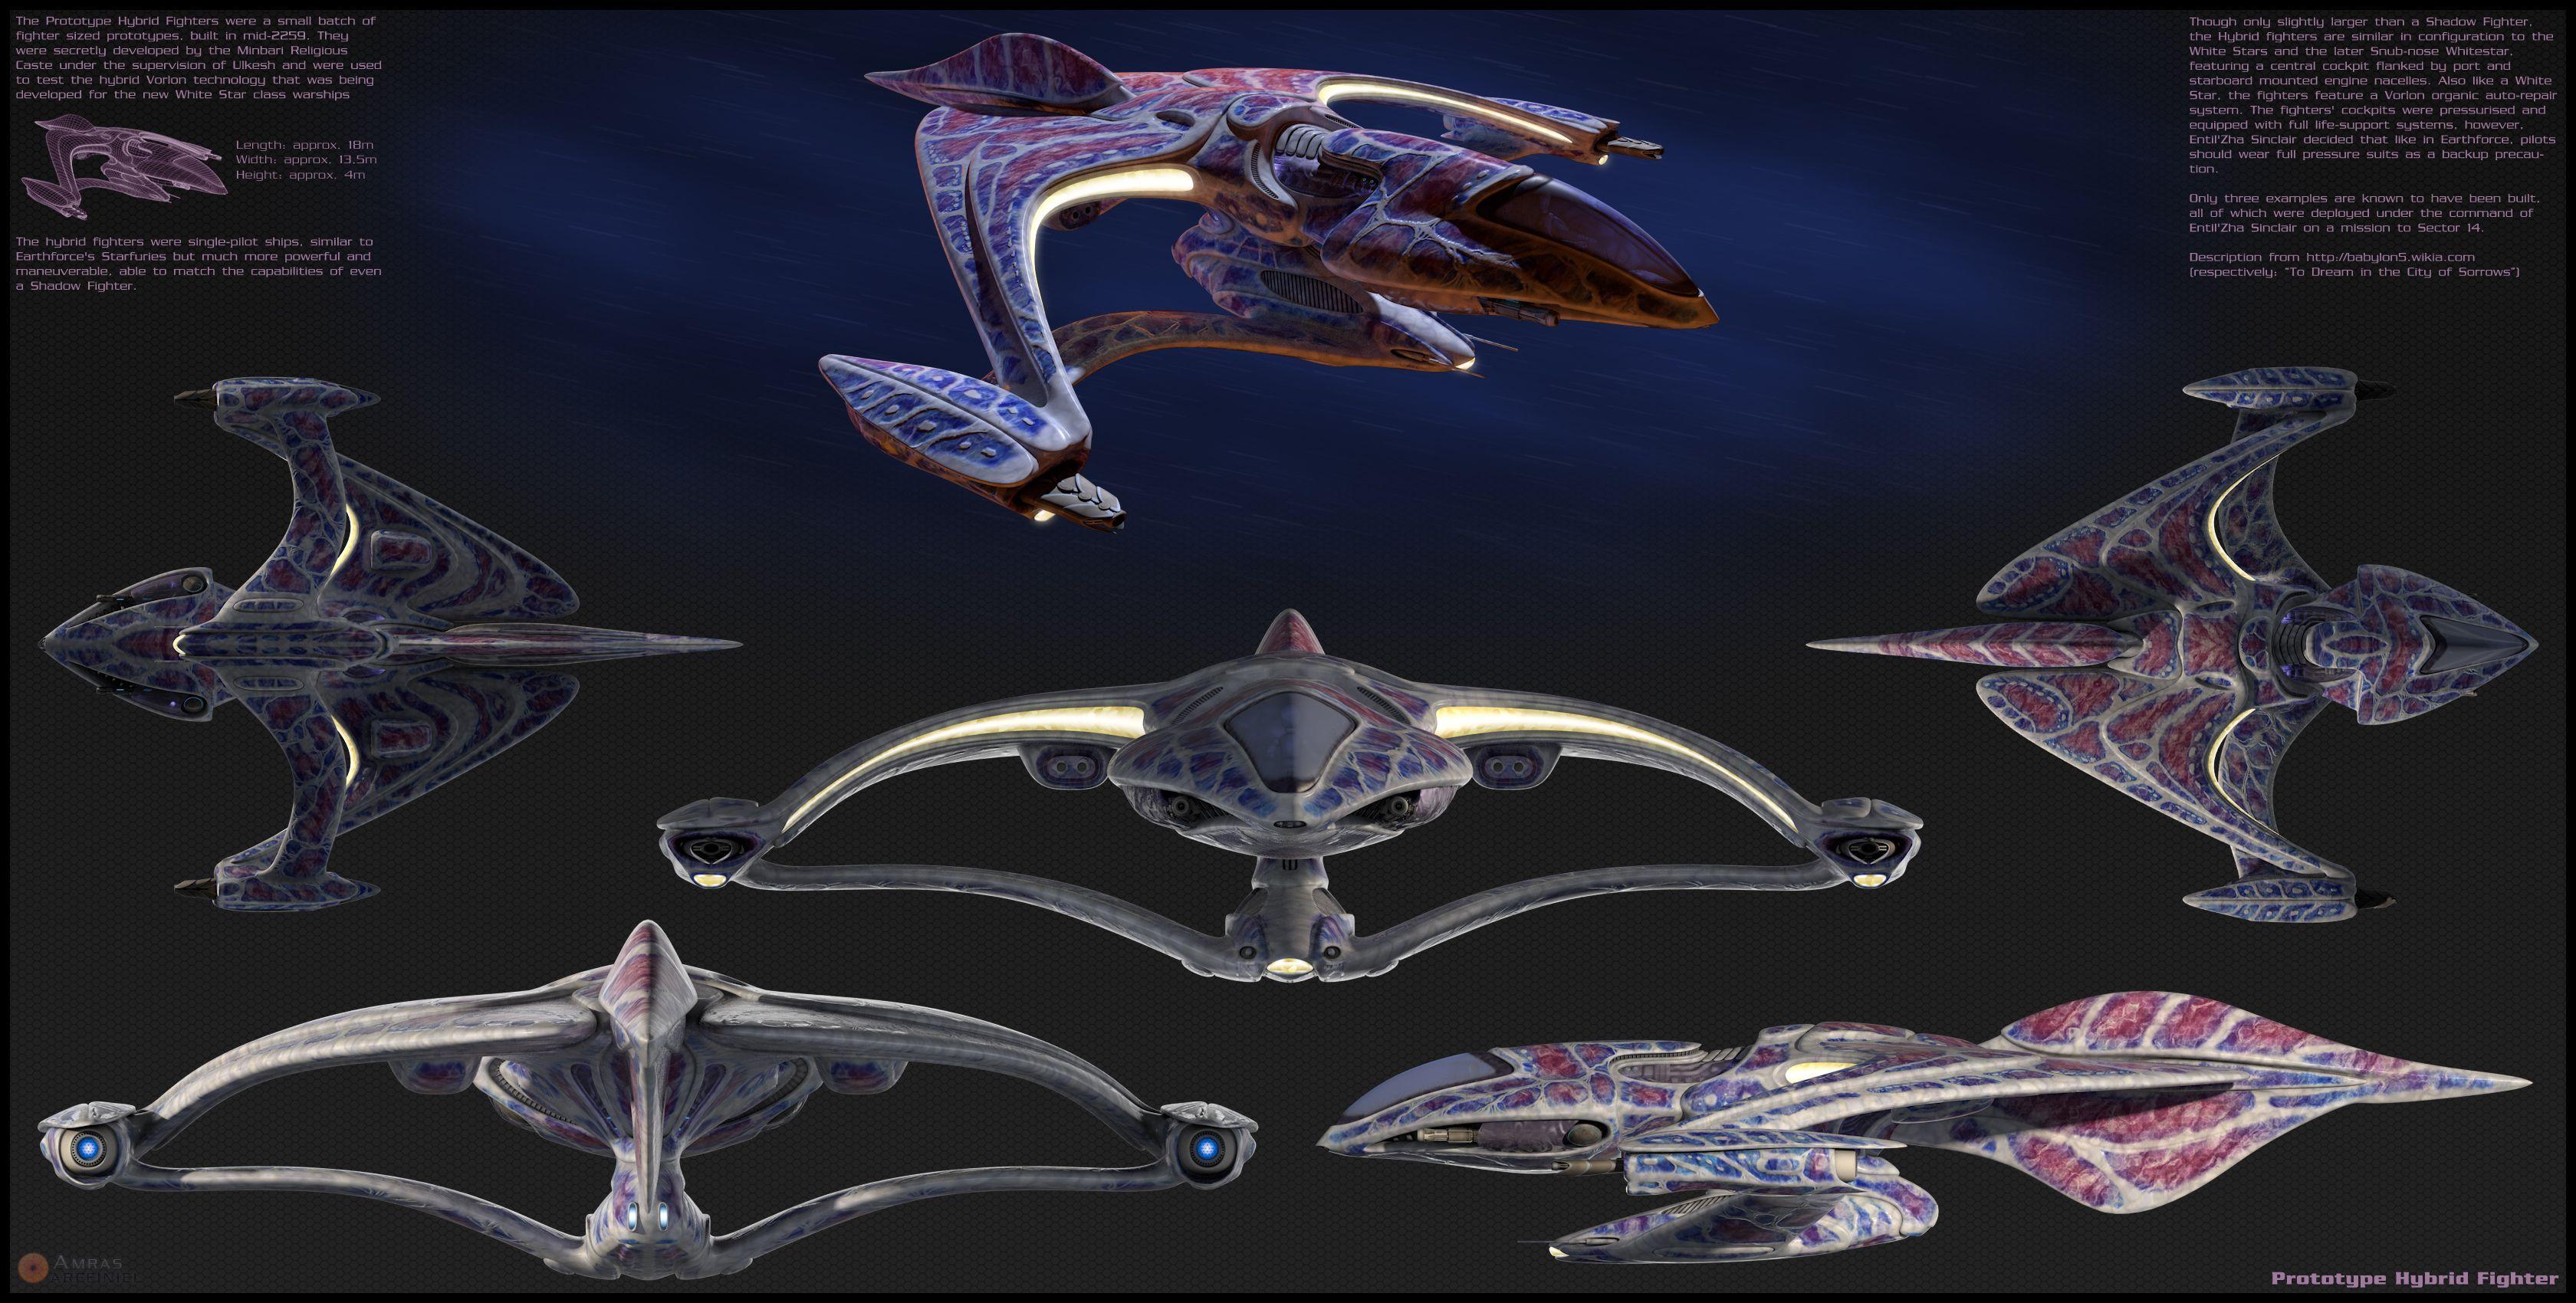 Babylon 5 - White Star Ship | Sci-Fi Blueprints, Models ... on robotech schematics, star trek space station schematics, deep space 9 schematics, andromeda ships schematics, stargate schematics,